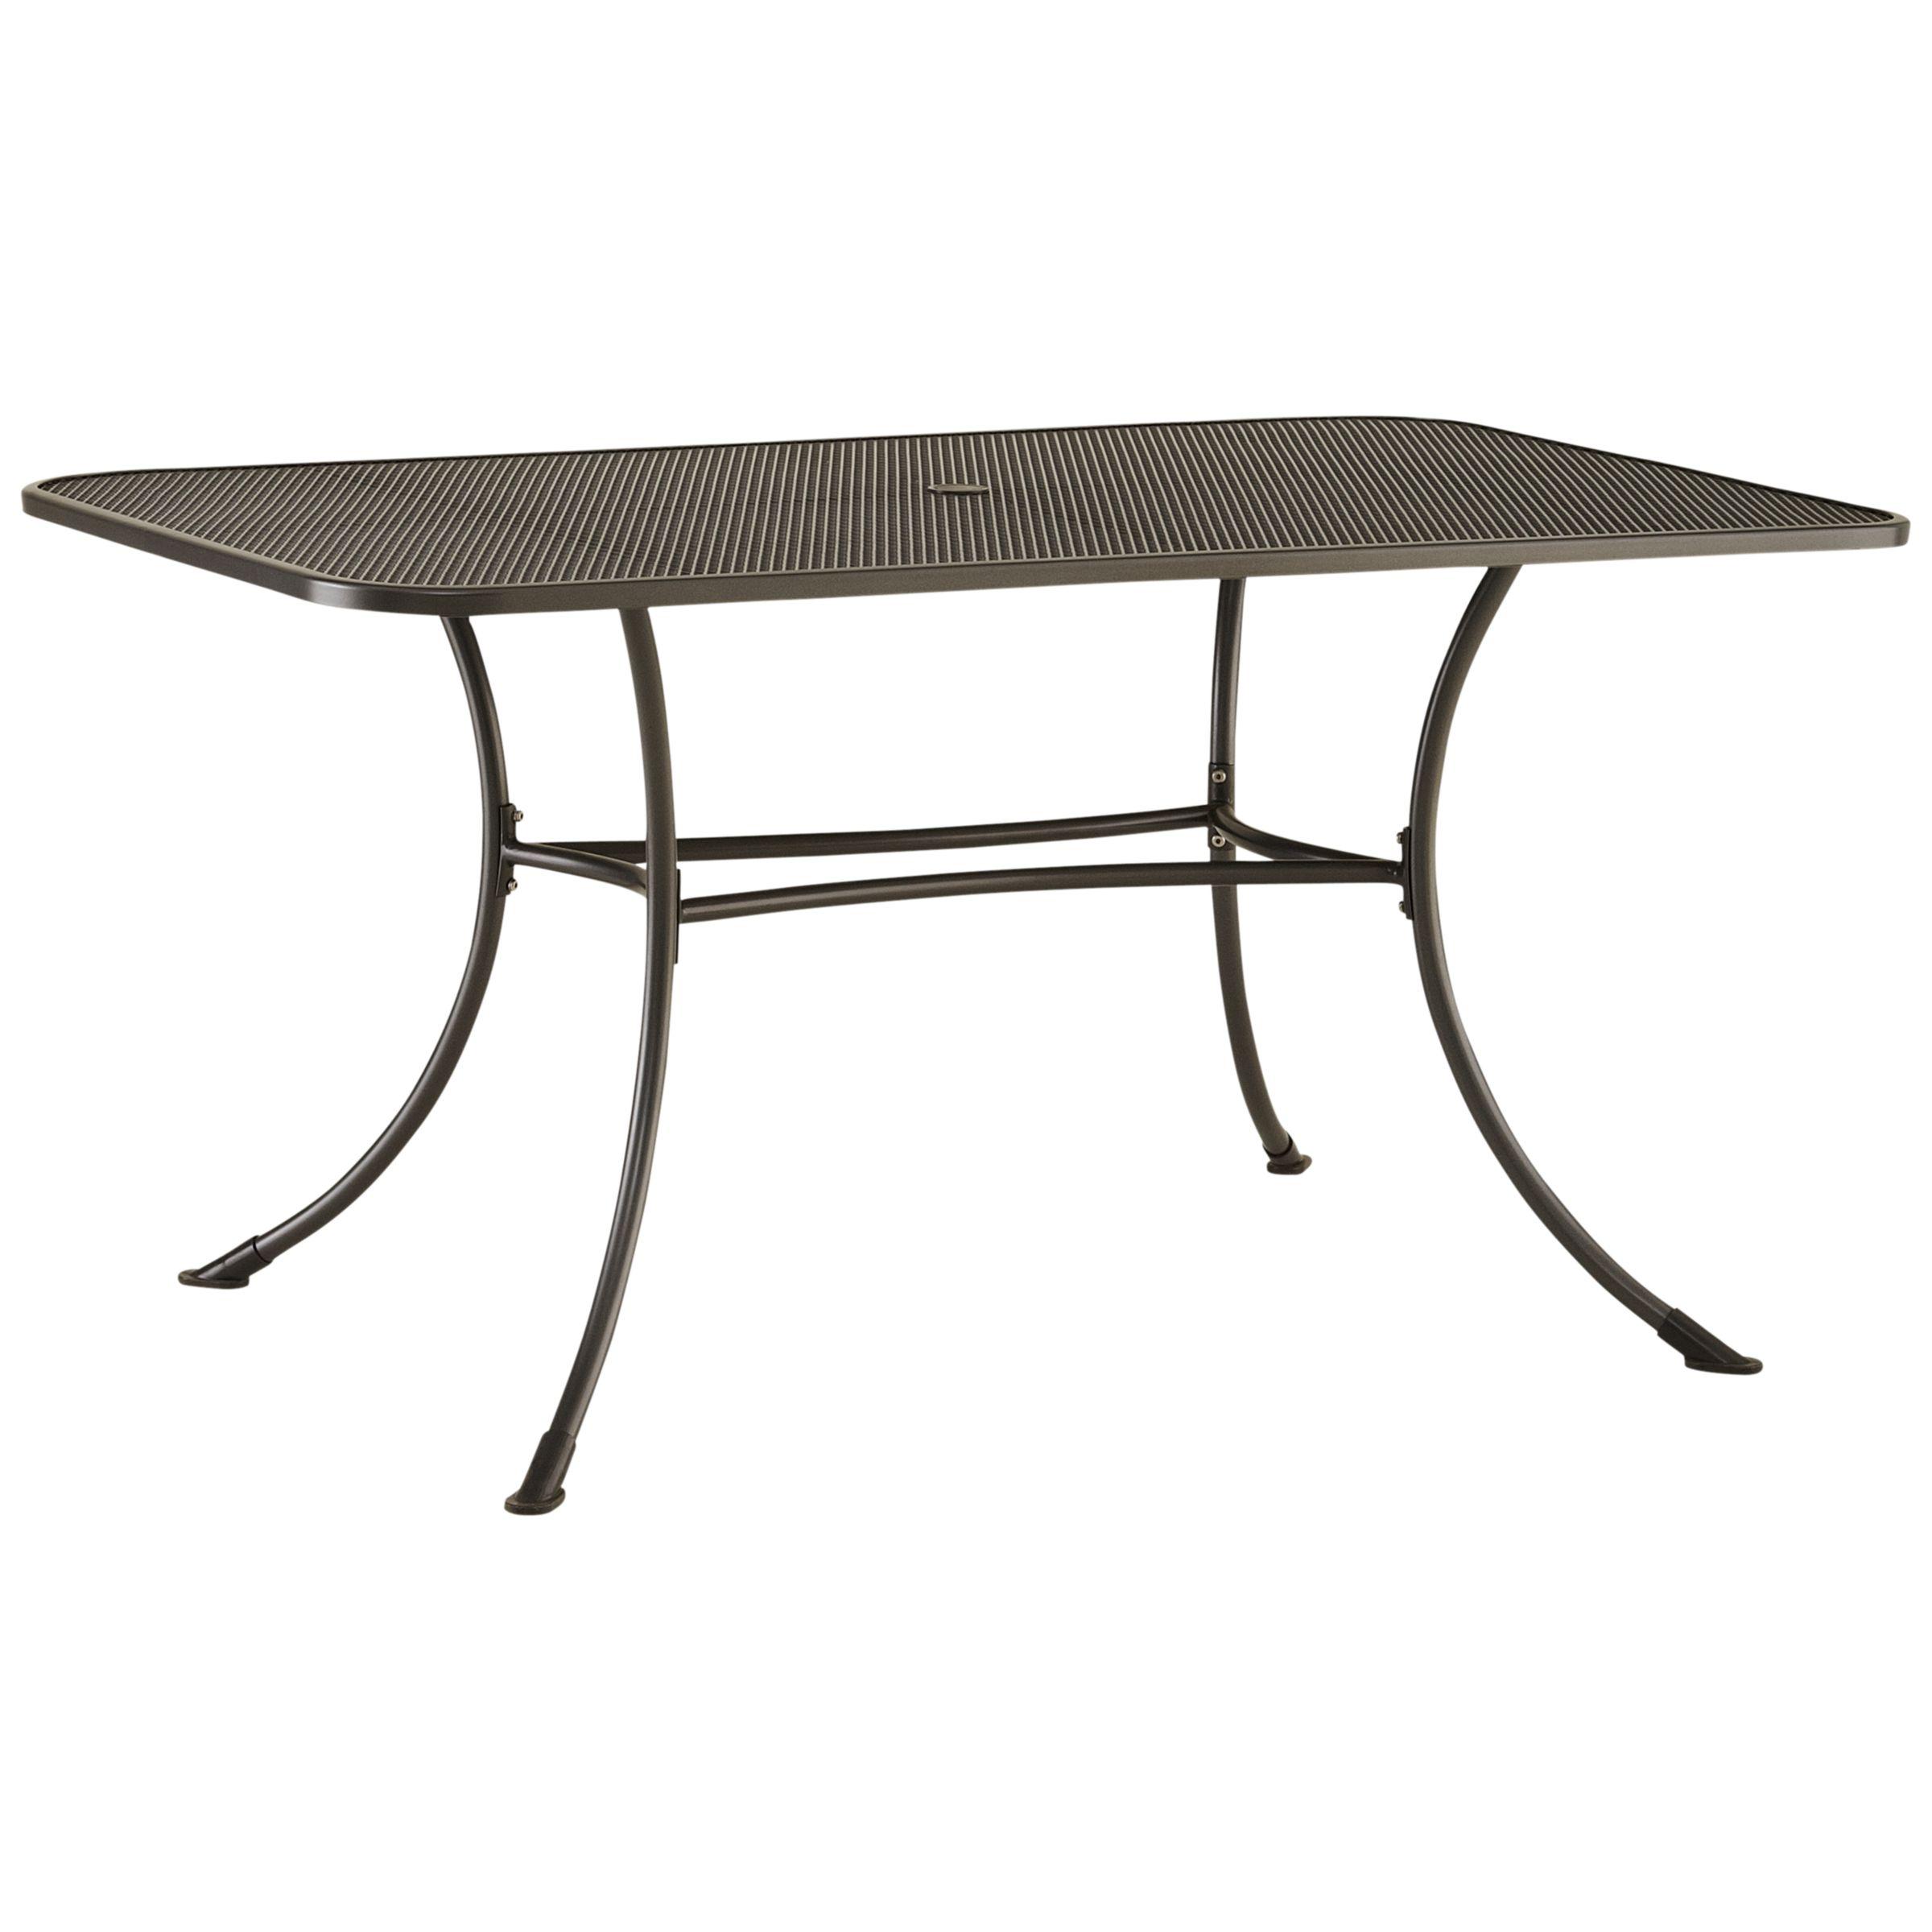 John Lewis & Partners Henley by KETTLER 6-Seater Rectangular Garden Dining Table, Grey